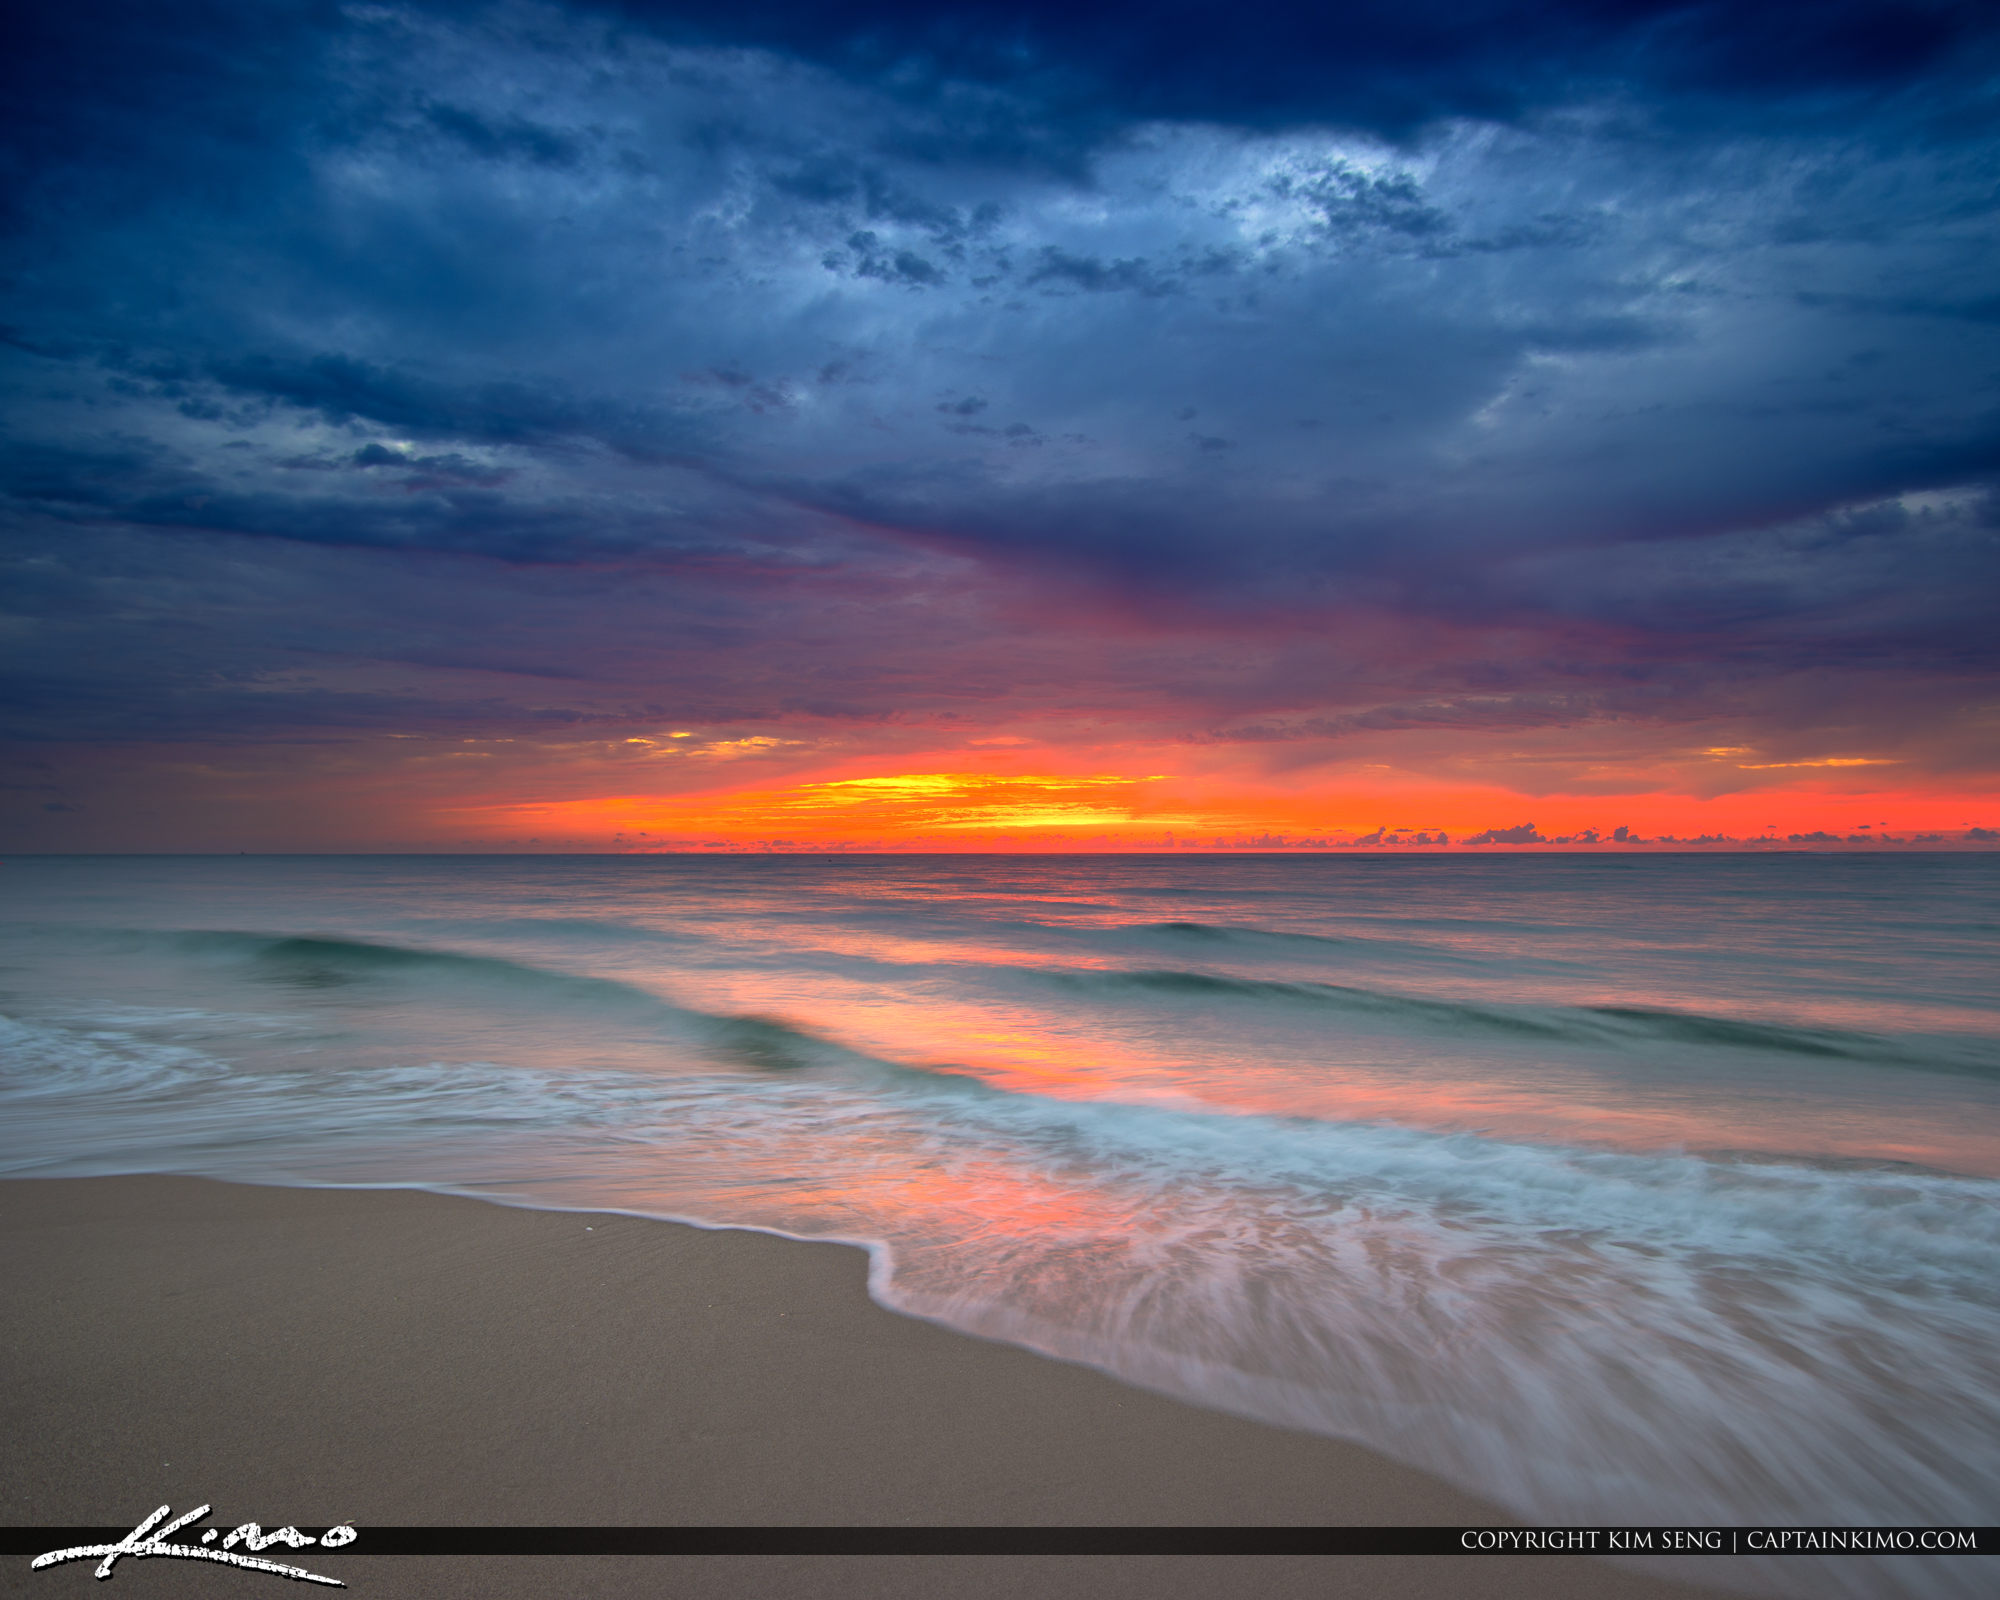 South Florida Sunrise at Beach